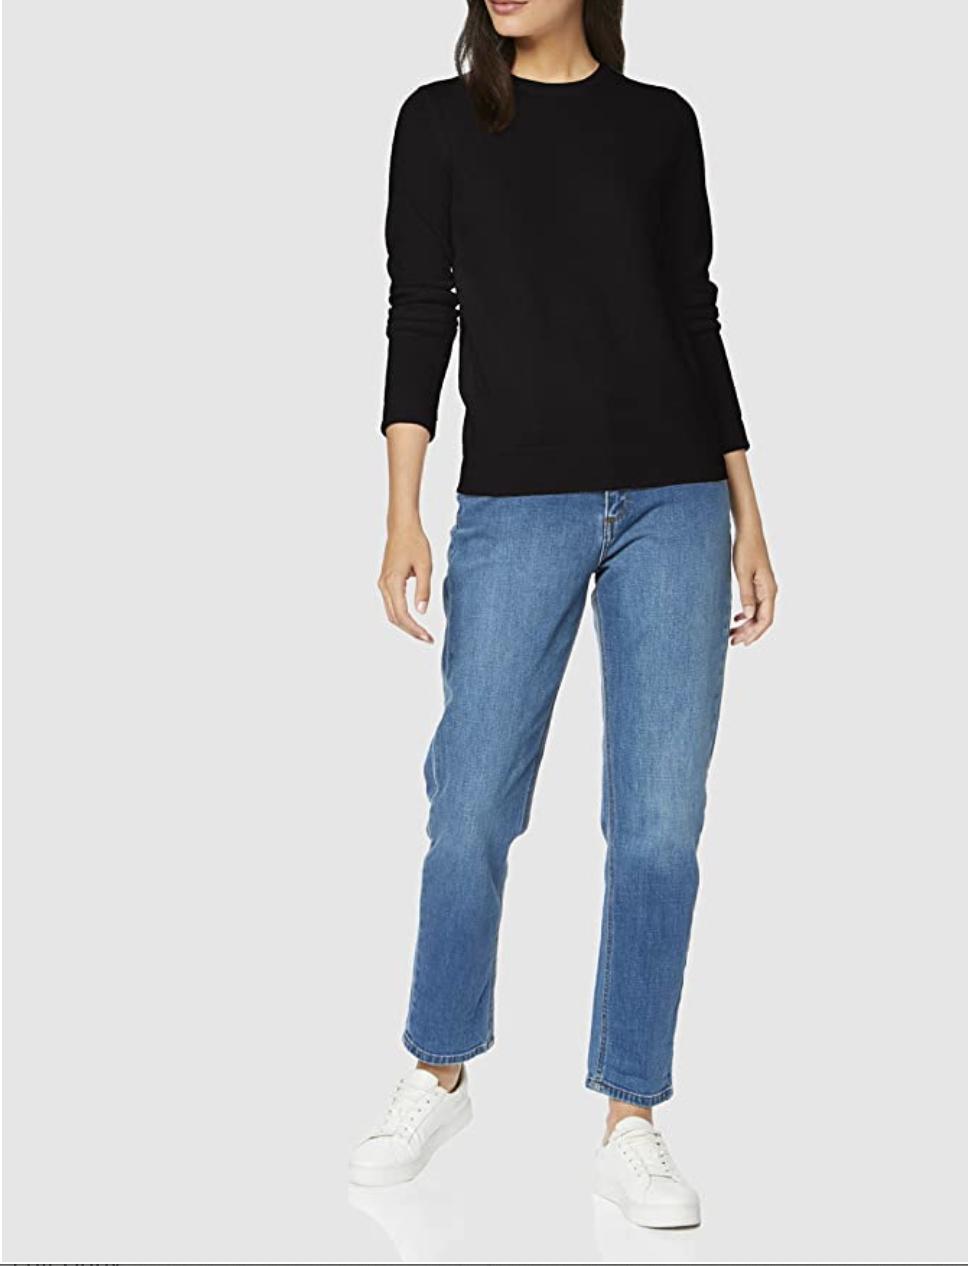 Model in a black cashmere crewneck sweater